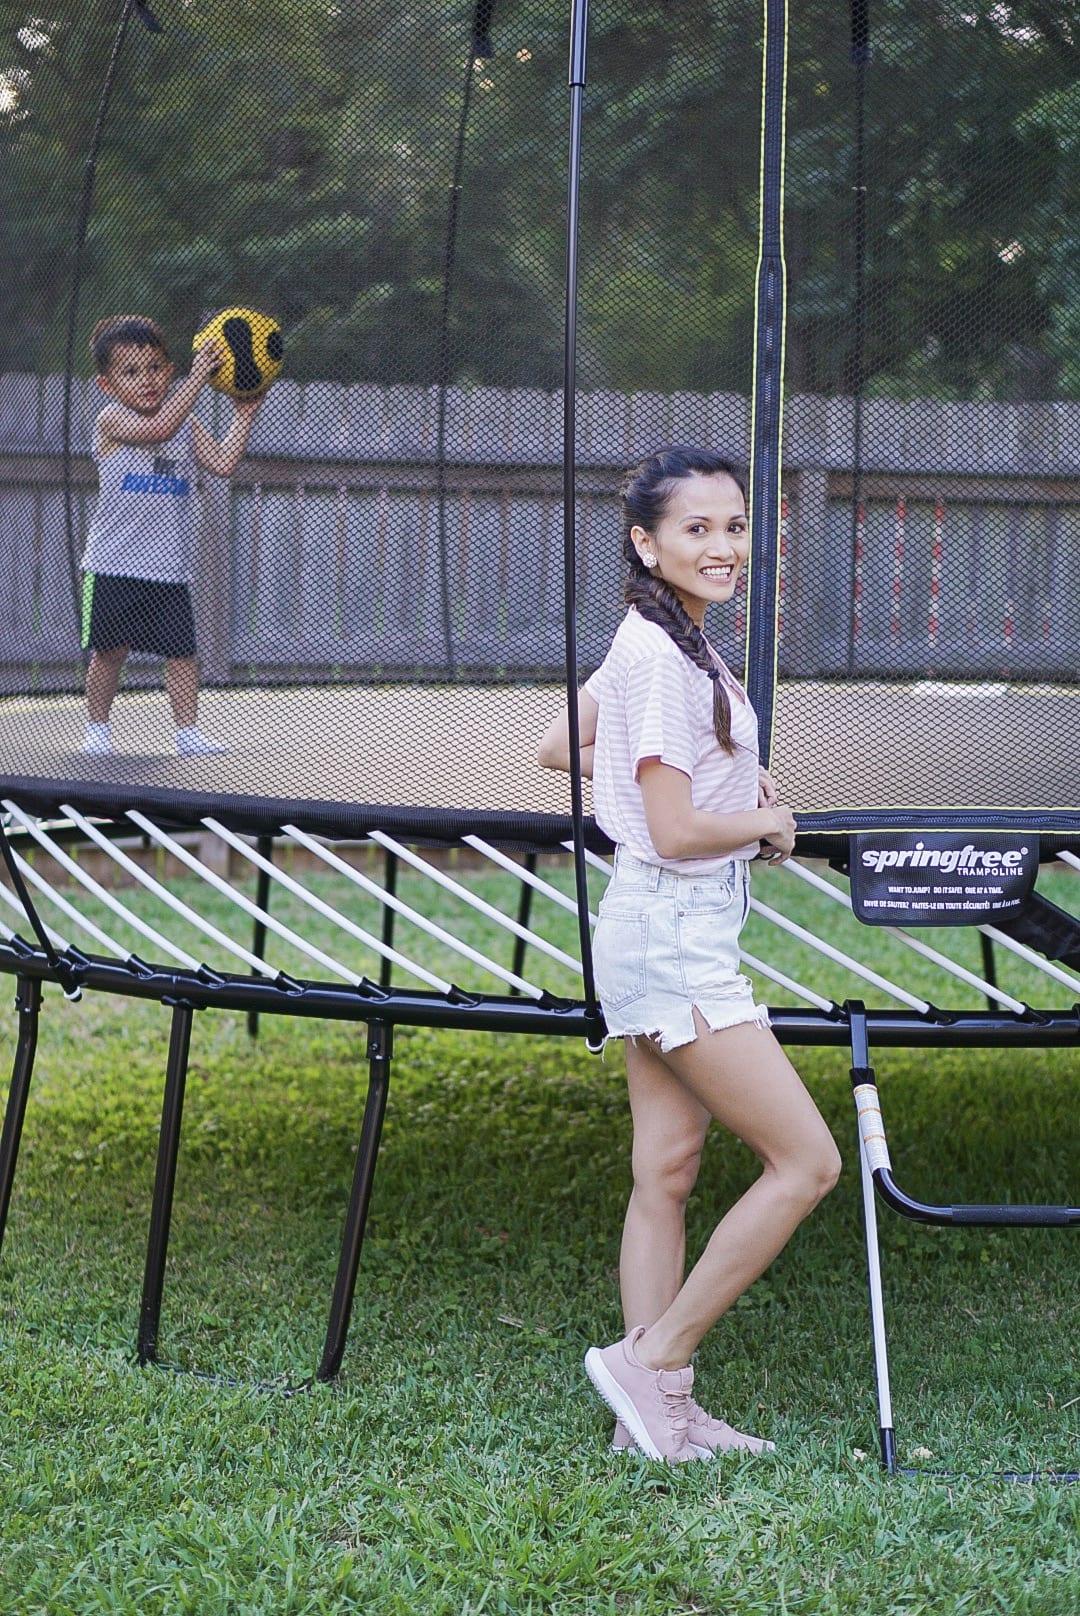 SPRINGREE TRAMPOLINE, backyard activities, toddler activities, summer activities, summer fun, trampoline safety, Adidas tubular